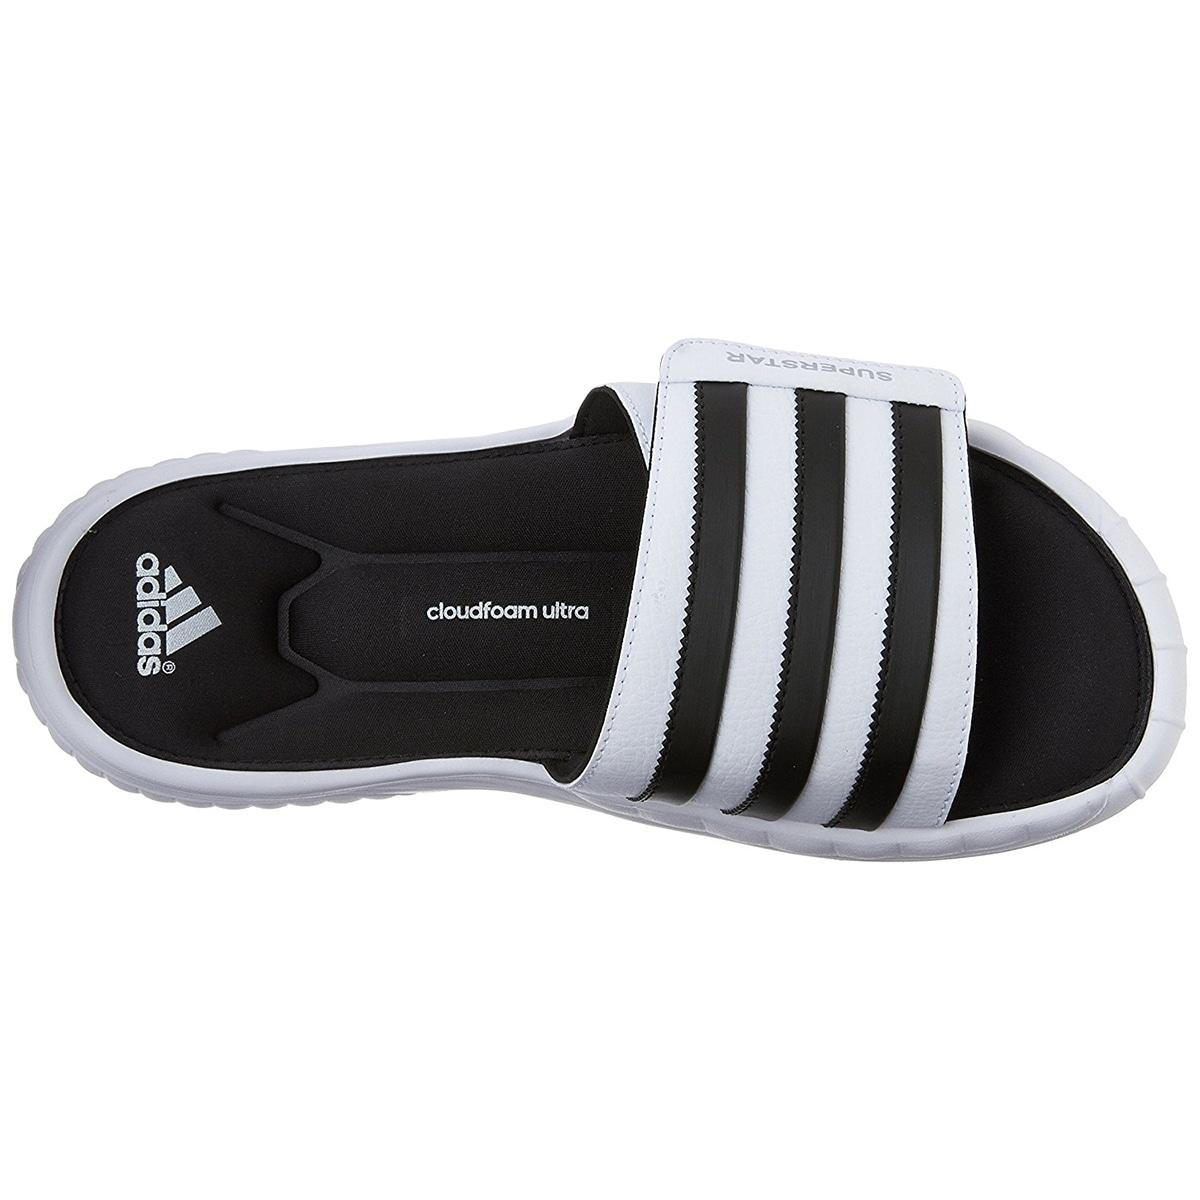 Negozio adidas superstar 3g cloudfoam atletico slide sandali bianchi